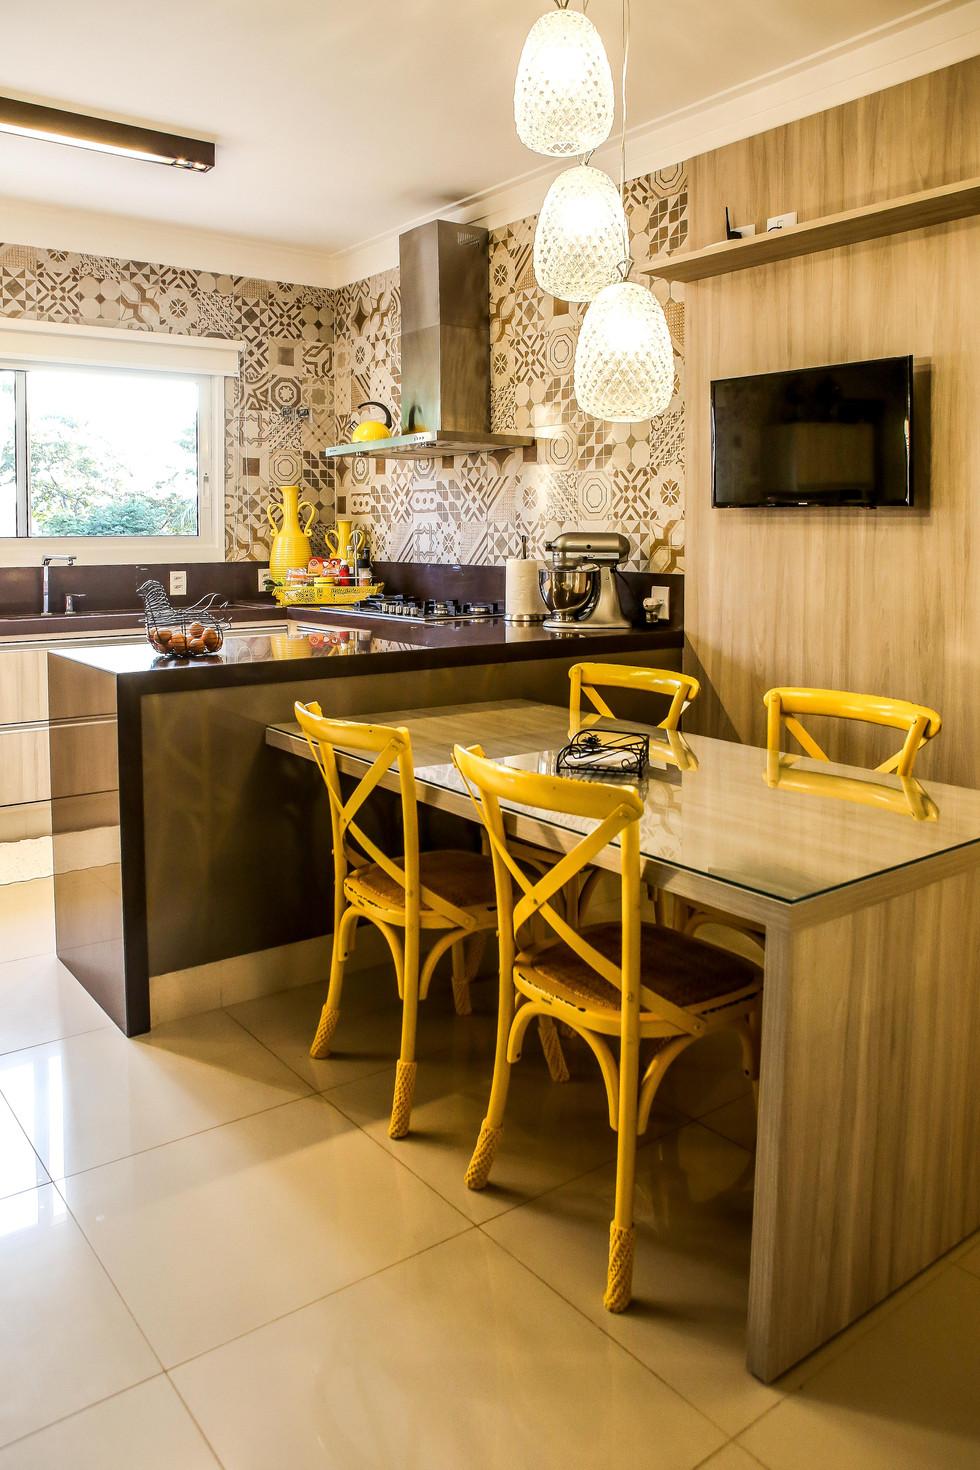 sandro costa fotografo fotografia arquitetura tour virtual decoracao ambiente publiciadade projeto empreendiemento divulgacao foto esferica 360 sorocaba sao paulo cozinha